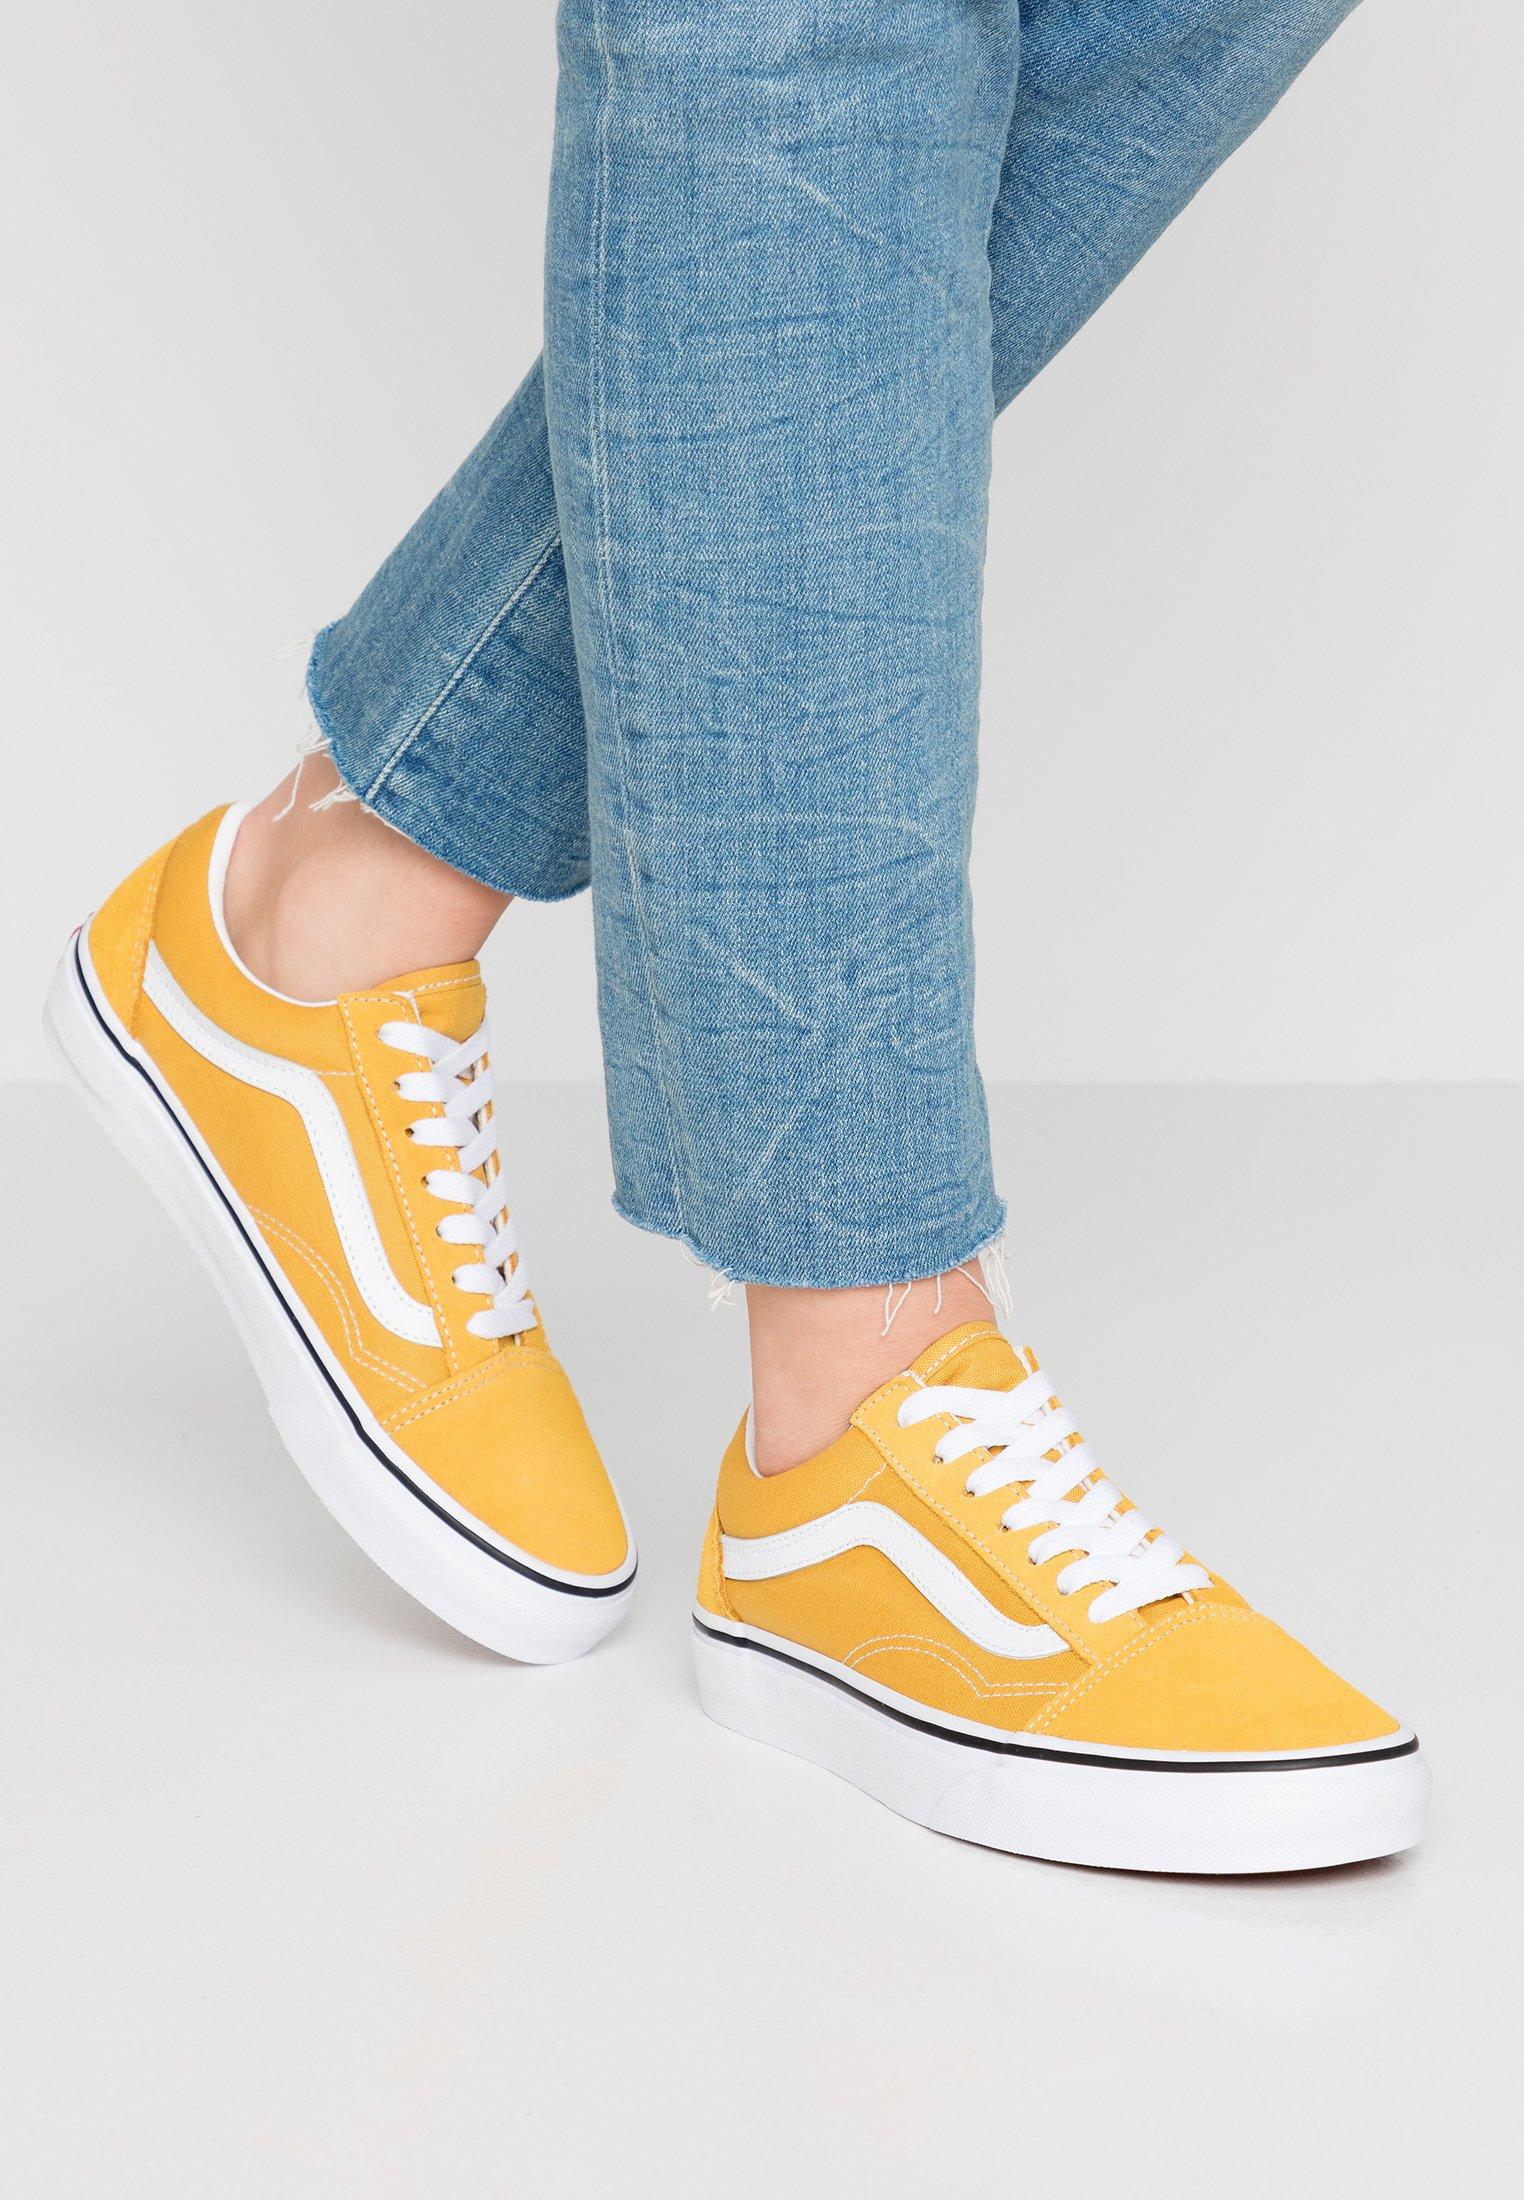 Vans OLD SKOOL - Baskets basses - yolk yellow/true white/jaune ...